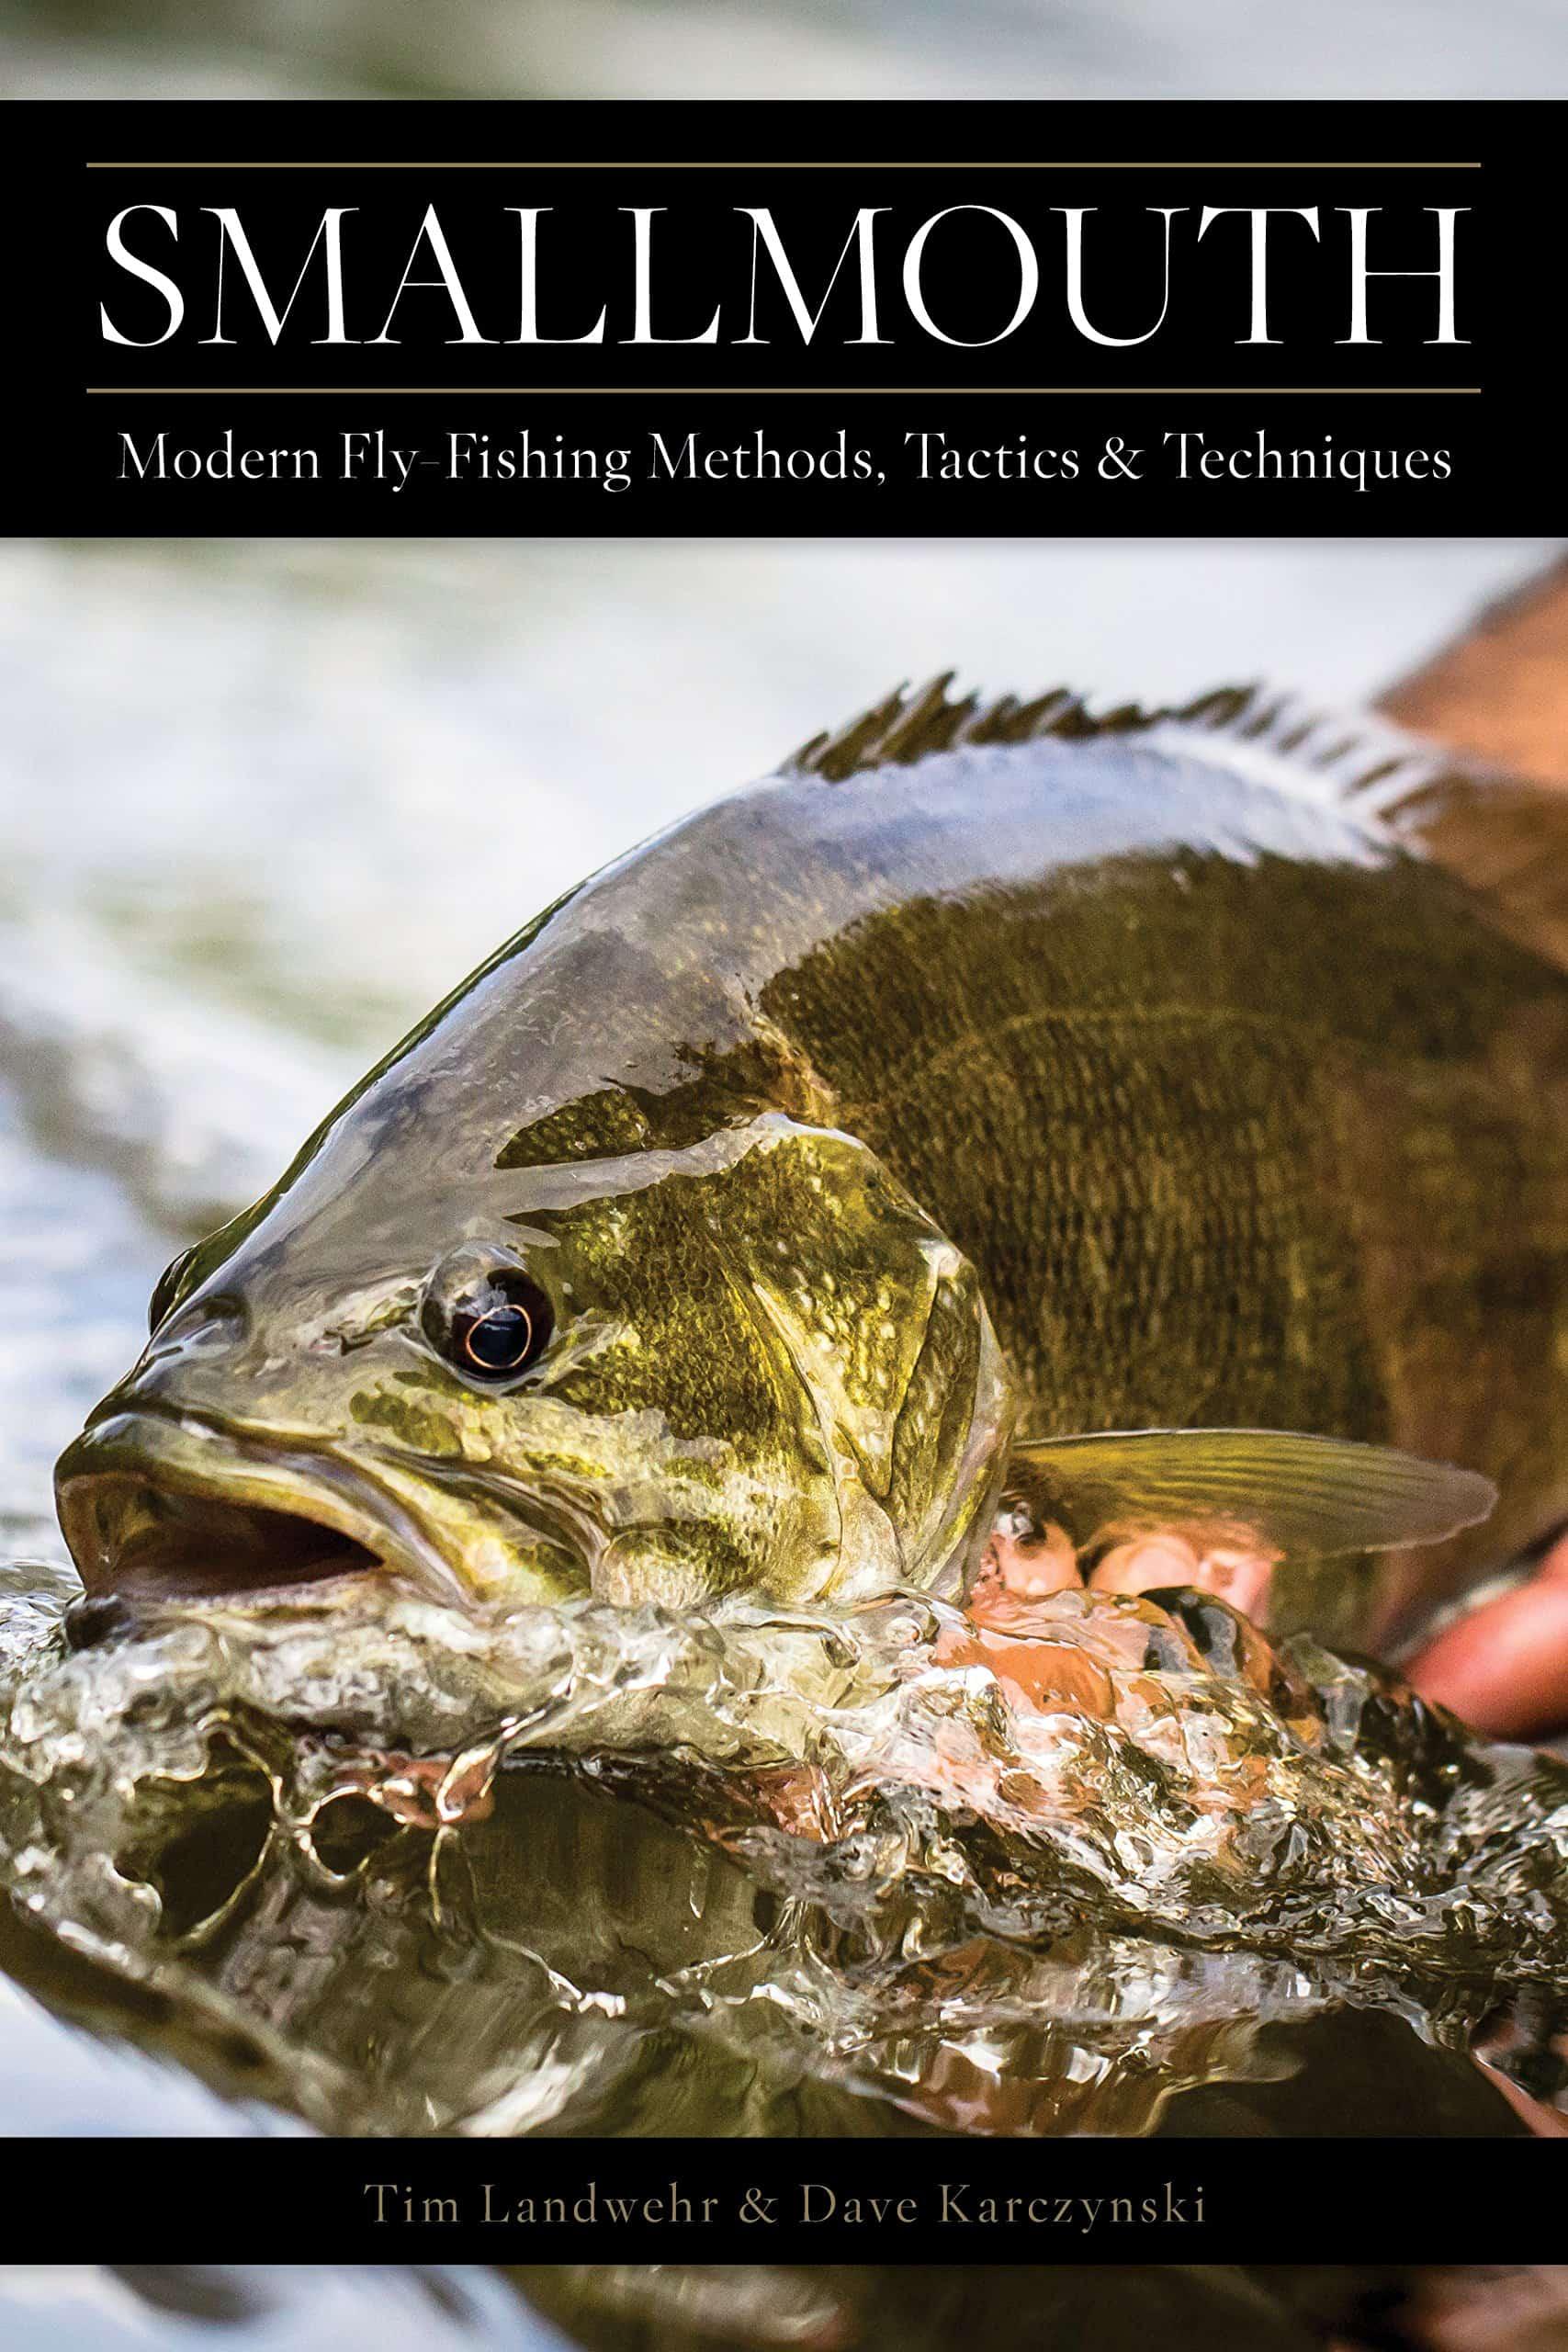 Smallmouth: Modern Fly Fishing Methods, Tactics & Techniques Dave Karczysnki The Drake Magazine